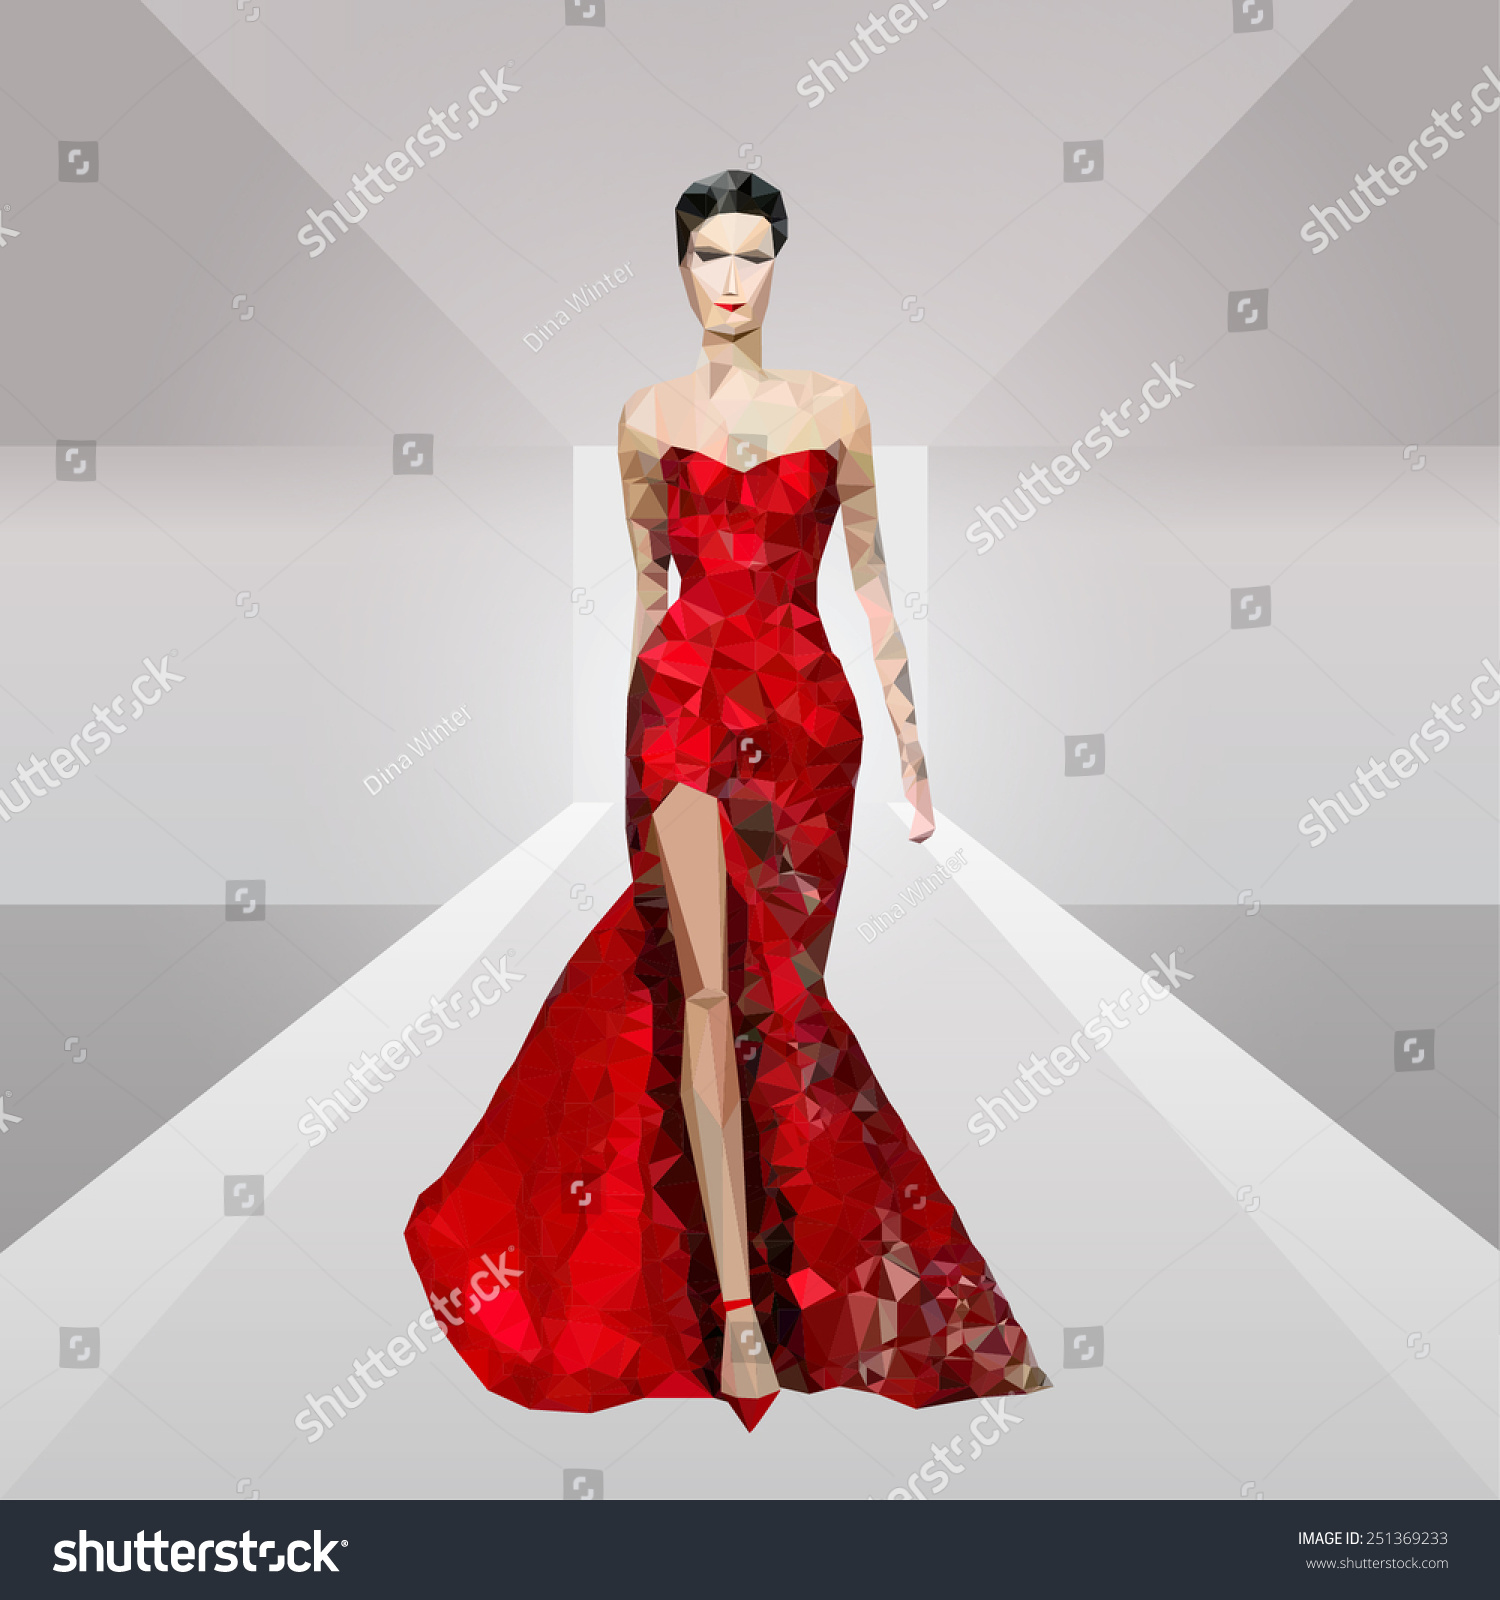 Black dress kisschasy lyrics - Red Dress Illustration